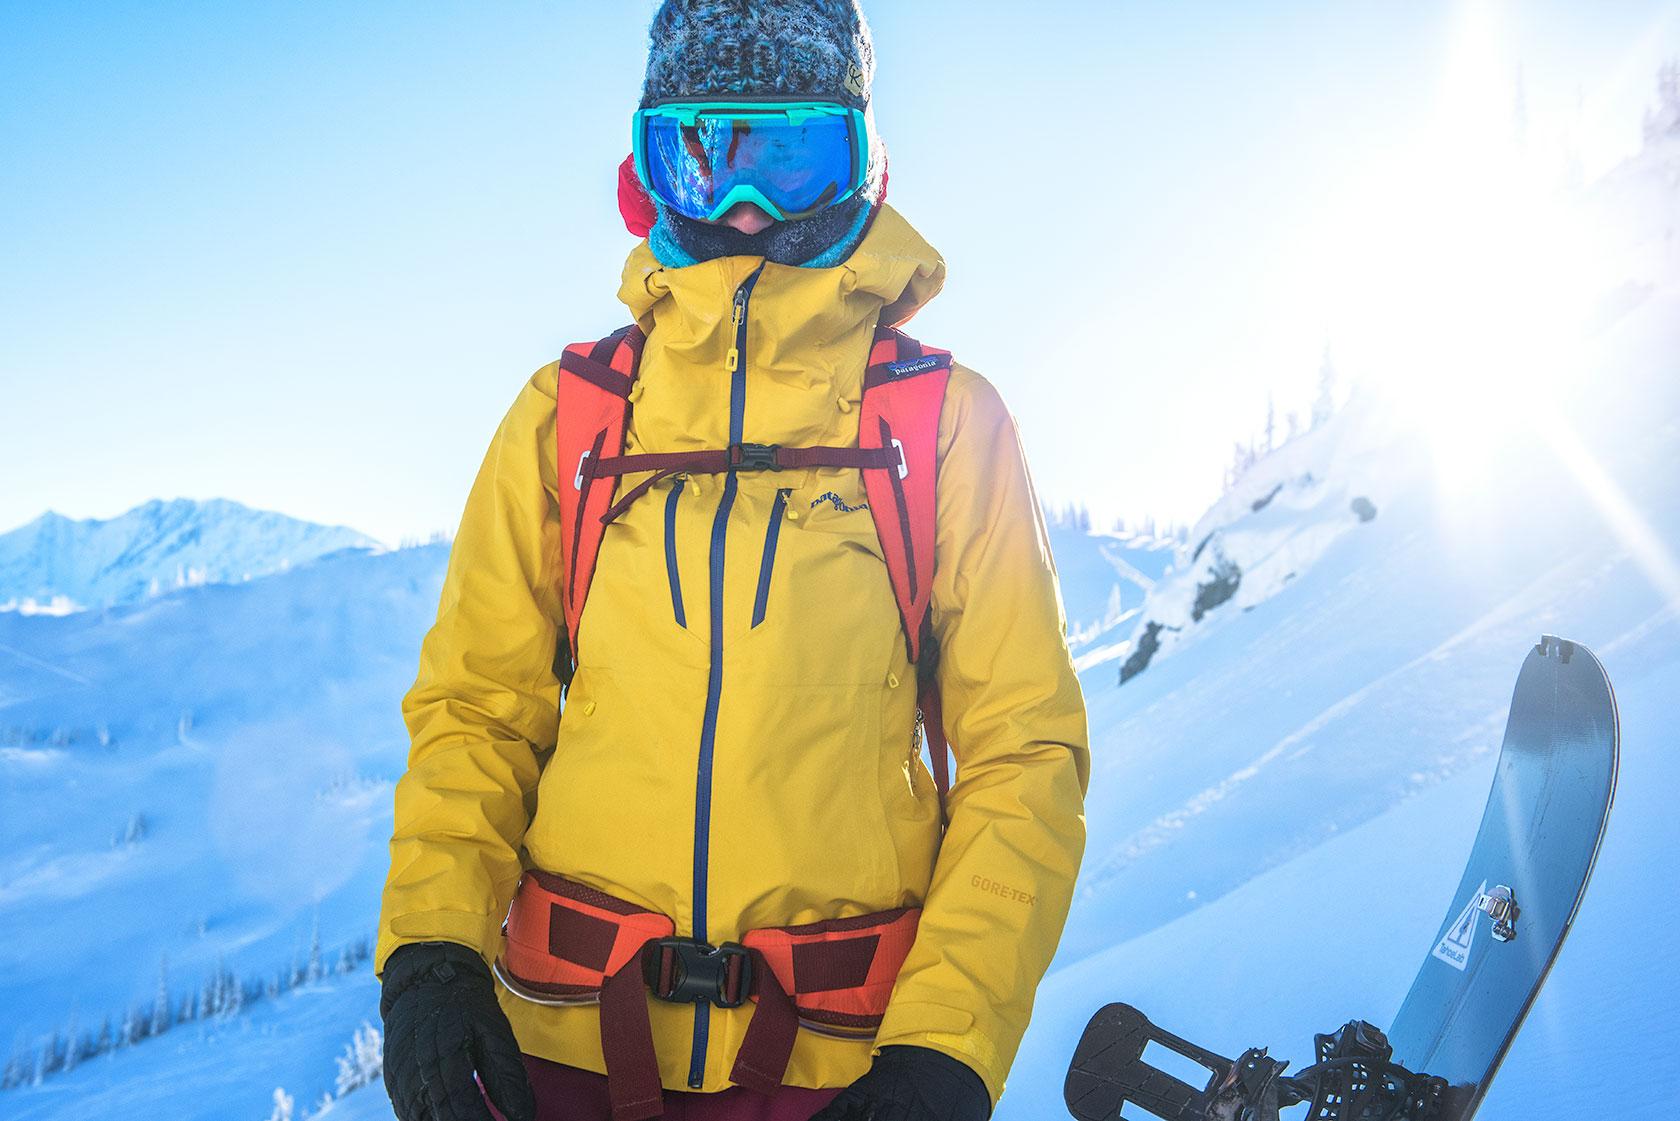 austin-trigg-patagonia-banff-alberta-winter-rogers-pass-british-columbia-canada-lifestyle-adventure-mountains-splitboard.jpg